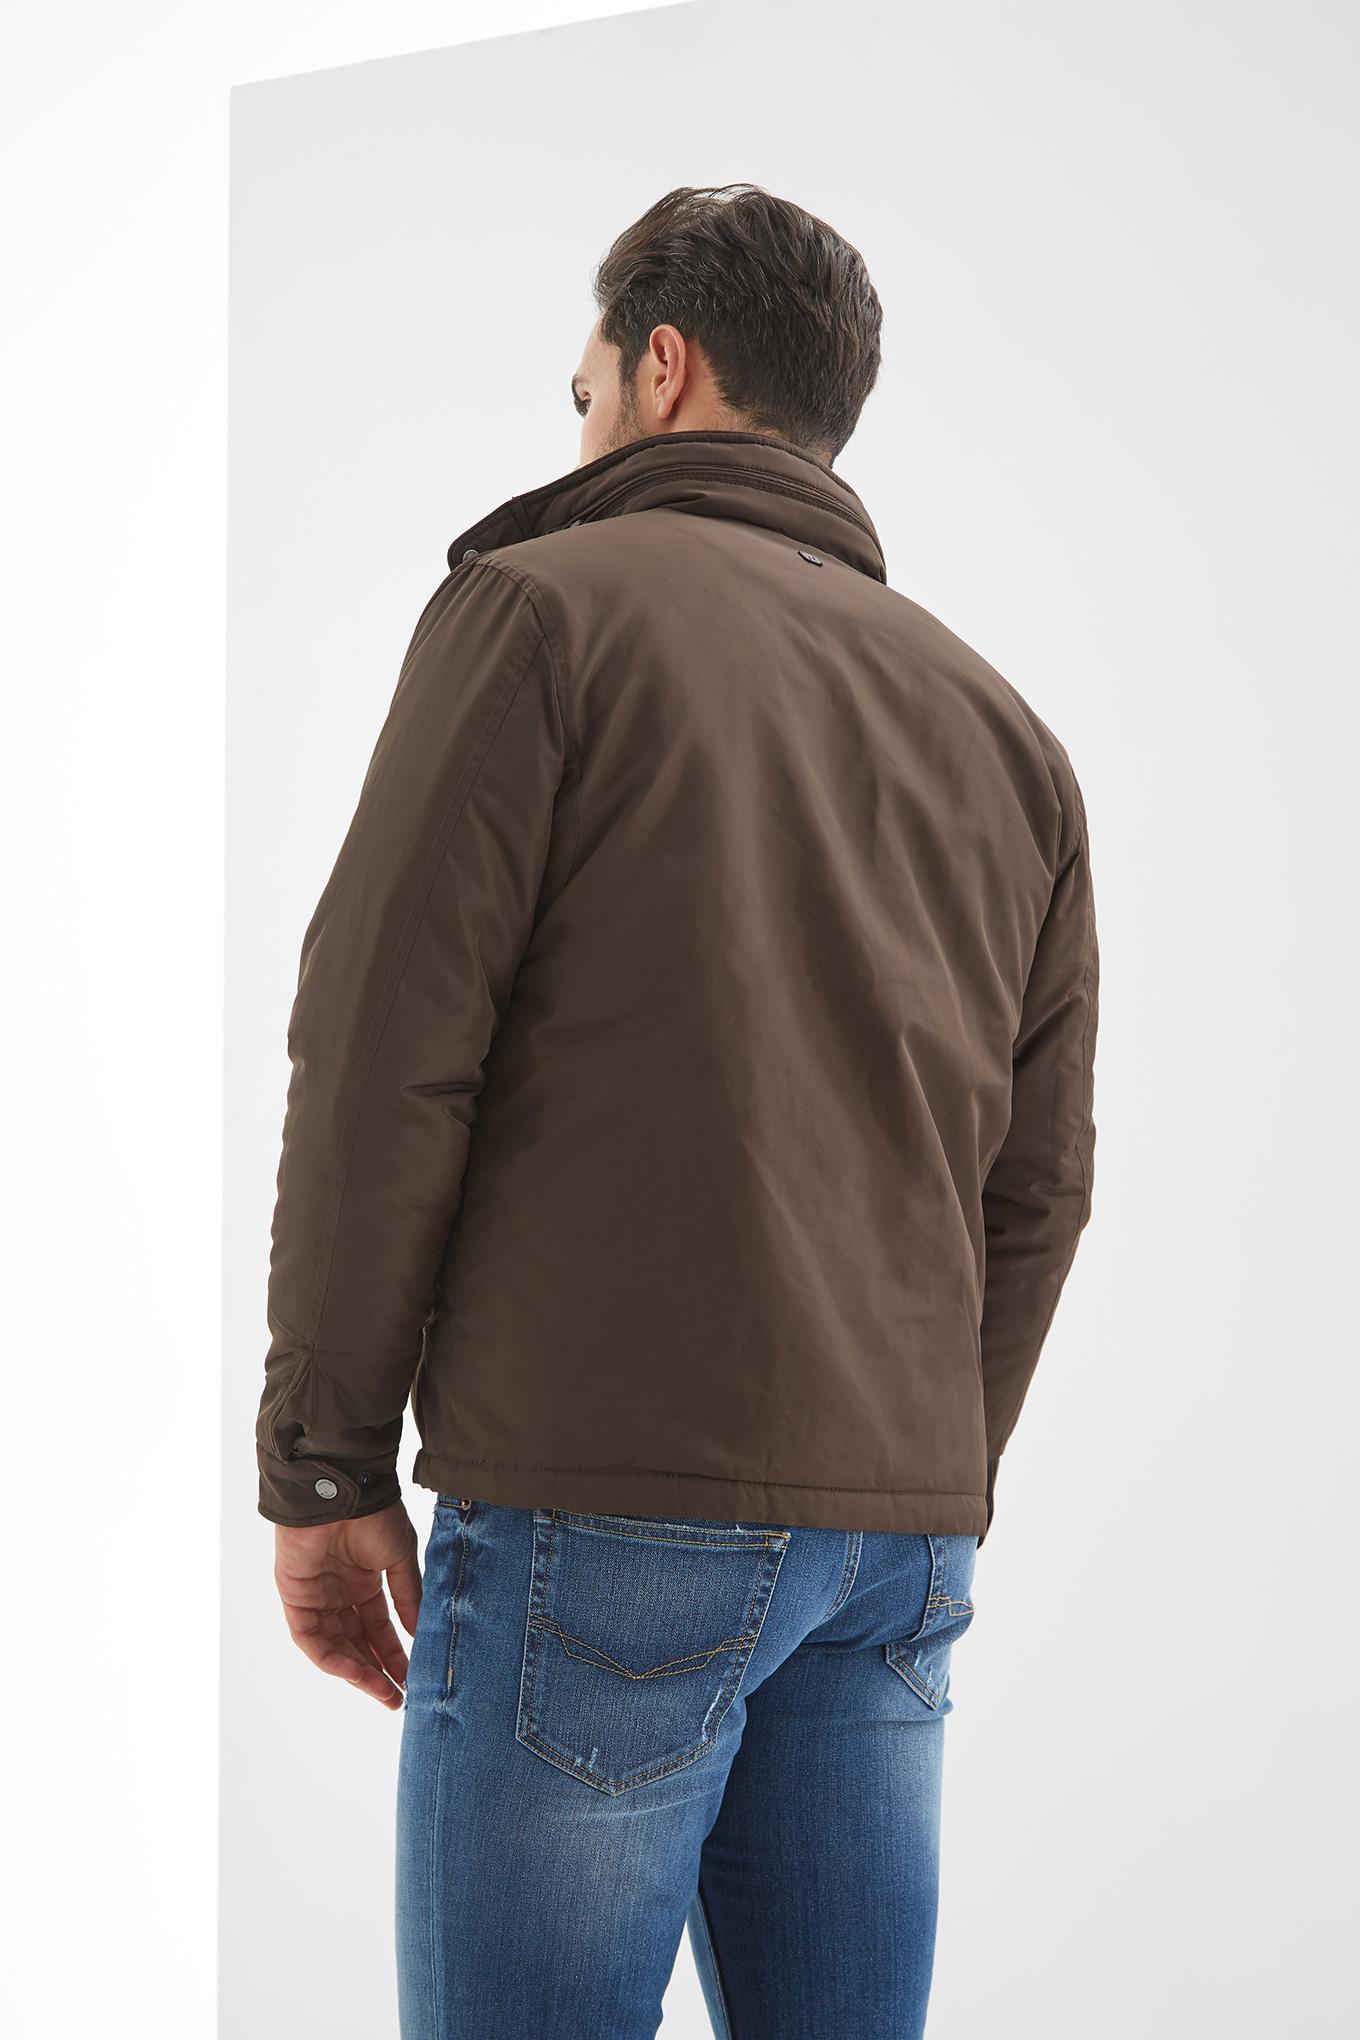 Jacket Brown Casual Man